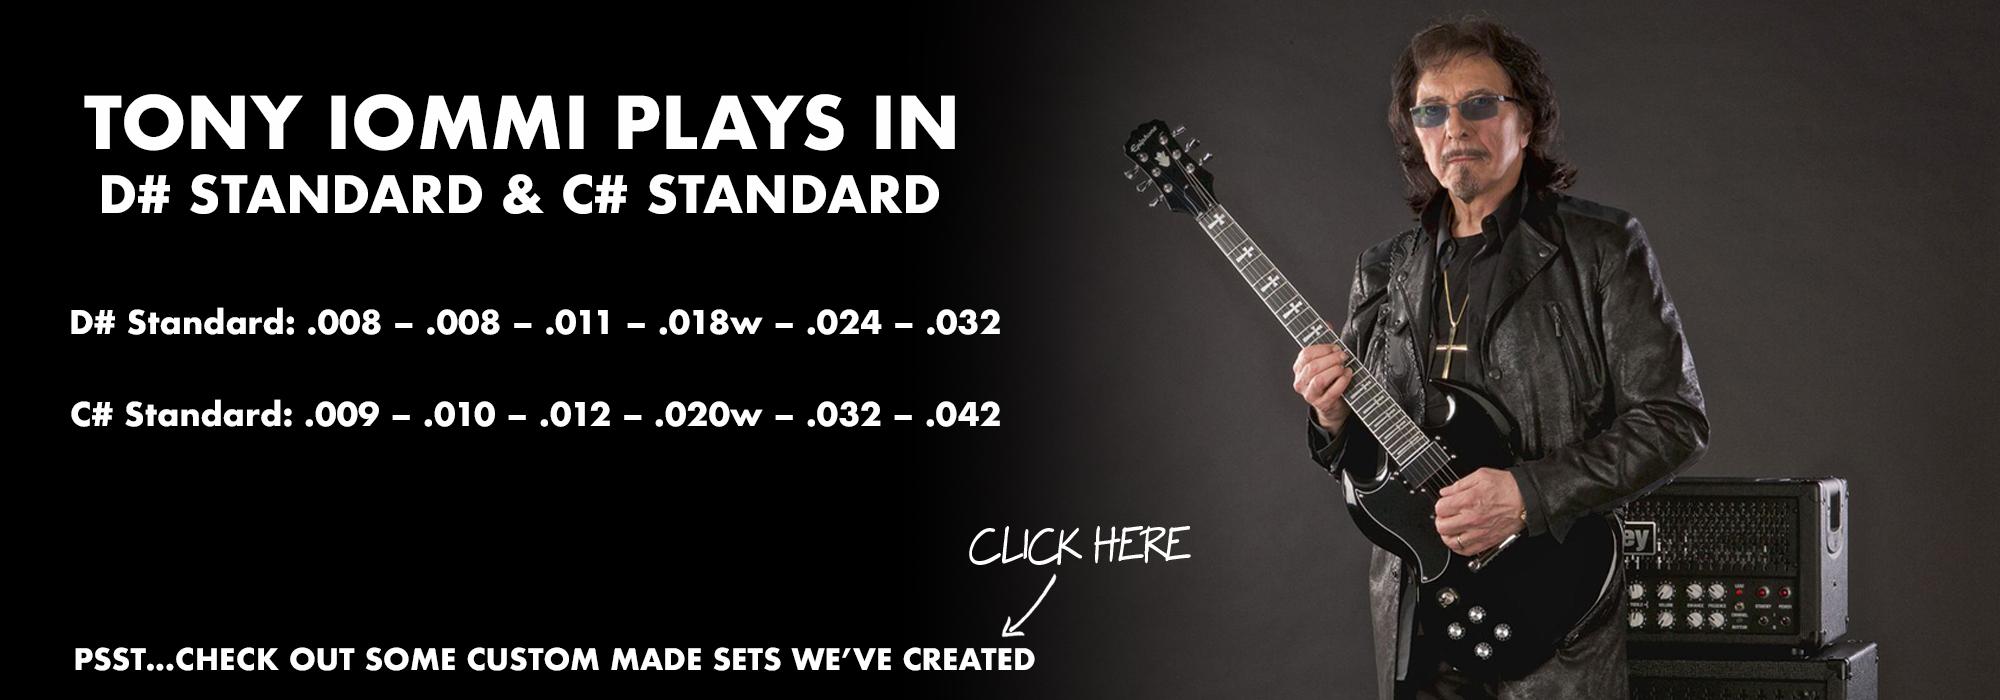 Tony Iommi's Electric Guitar String Gauges